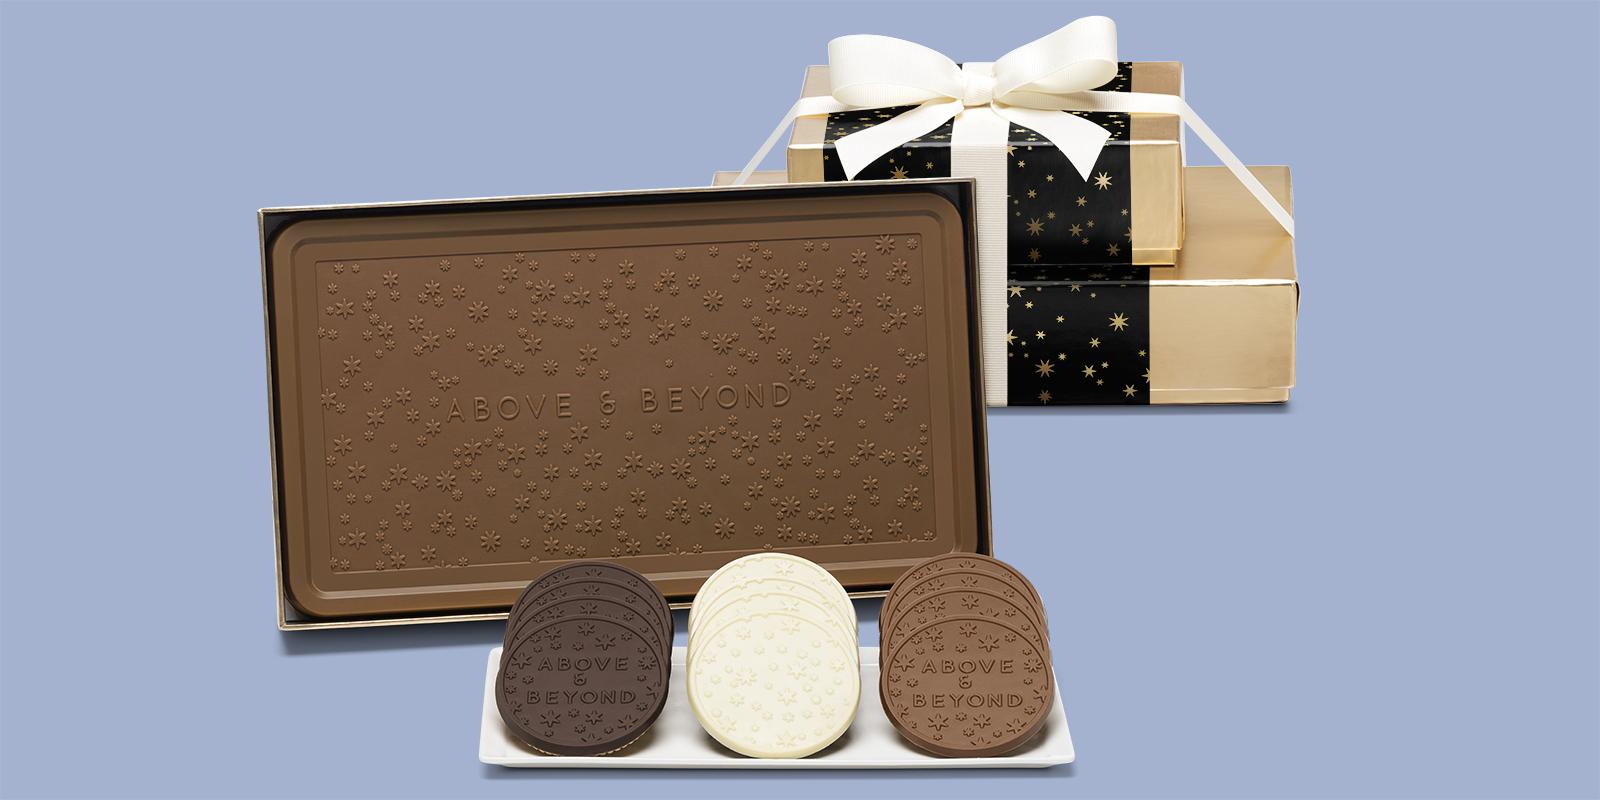 Kosher business gifts - appreciation